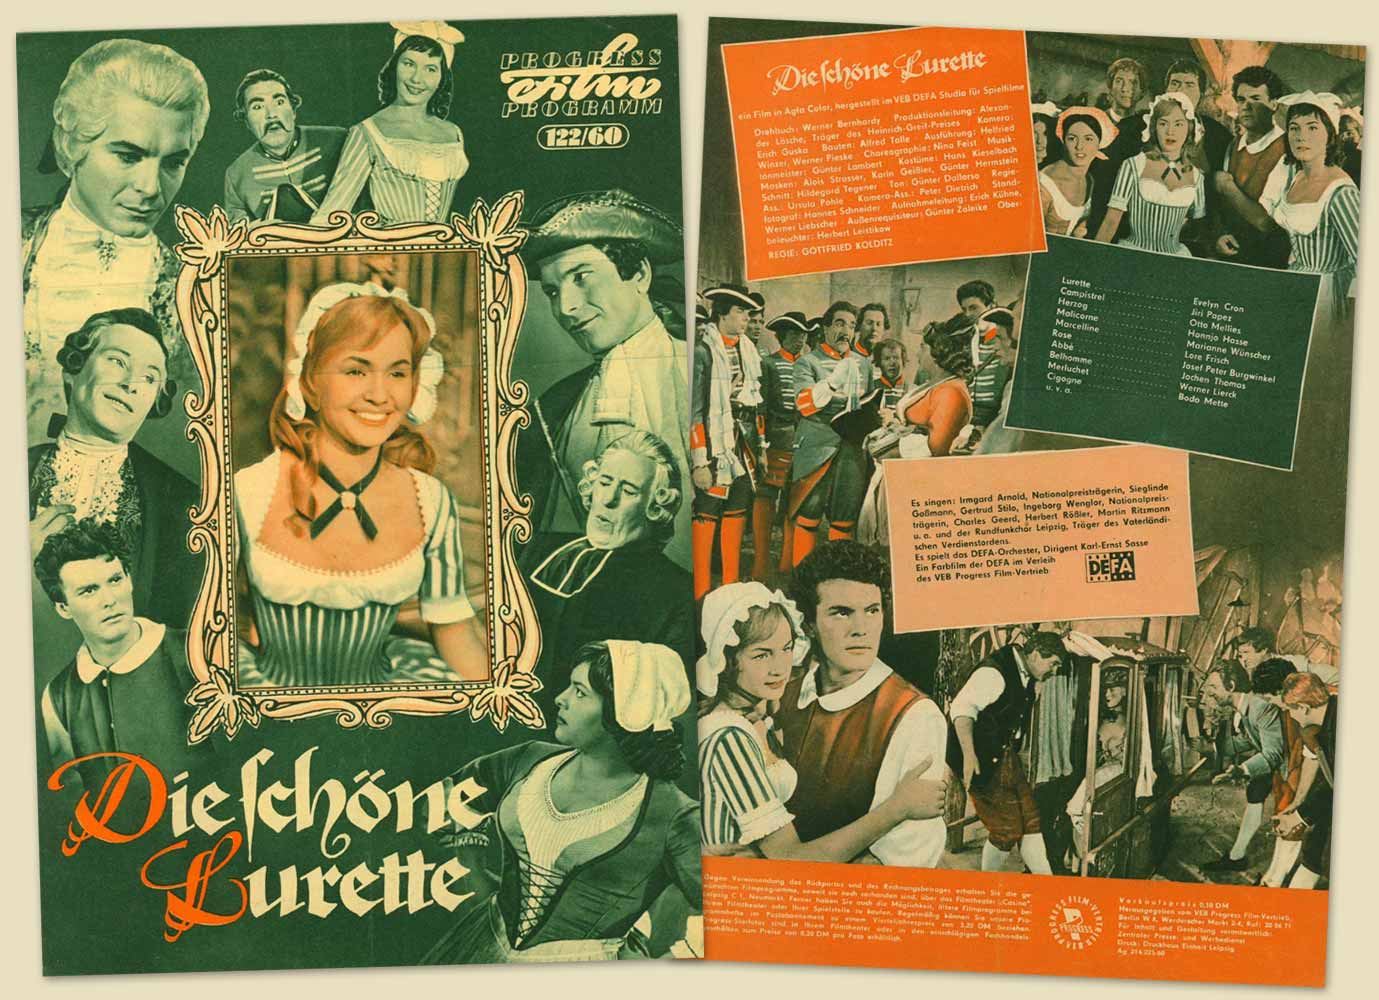 DEFA-Film-Programm-Schoene-Lurette-for-web